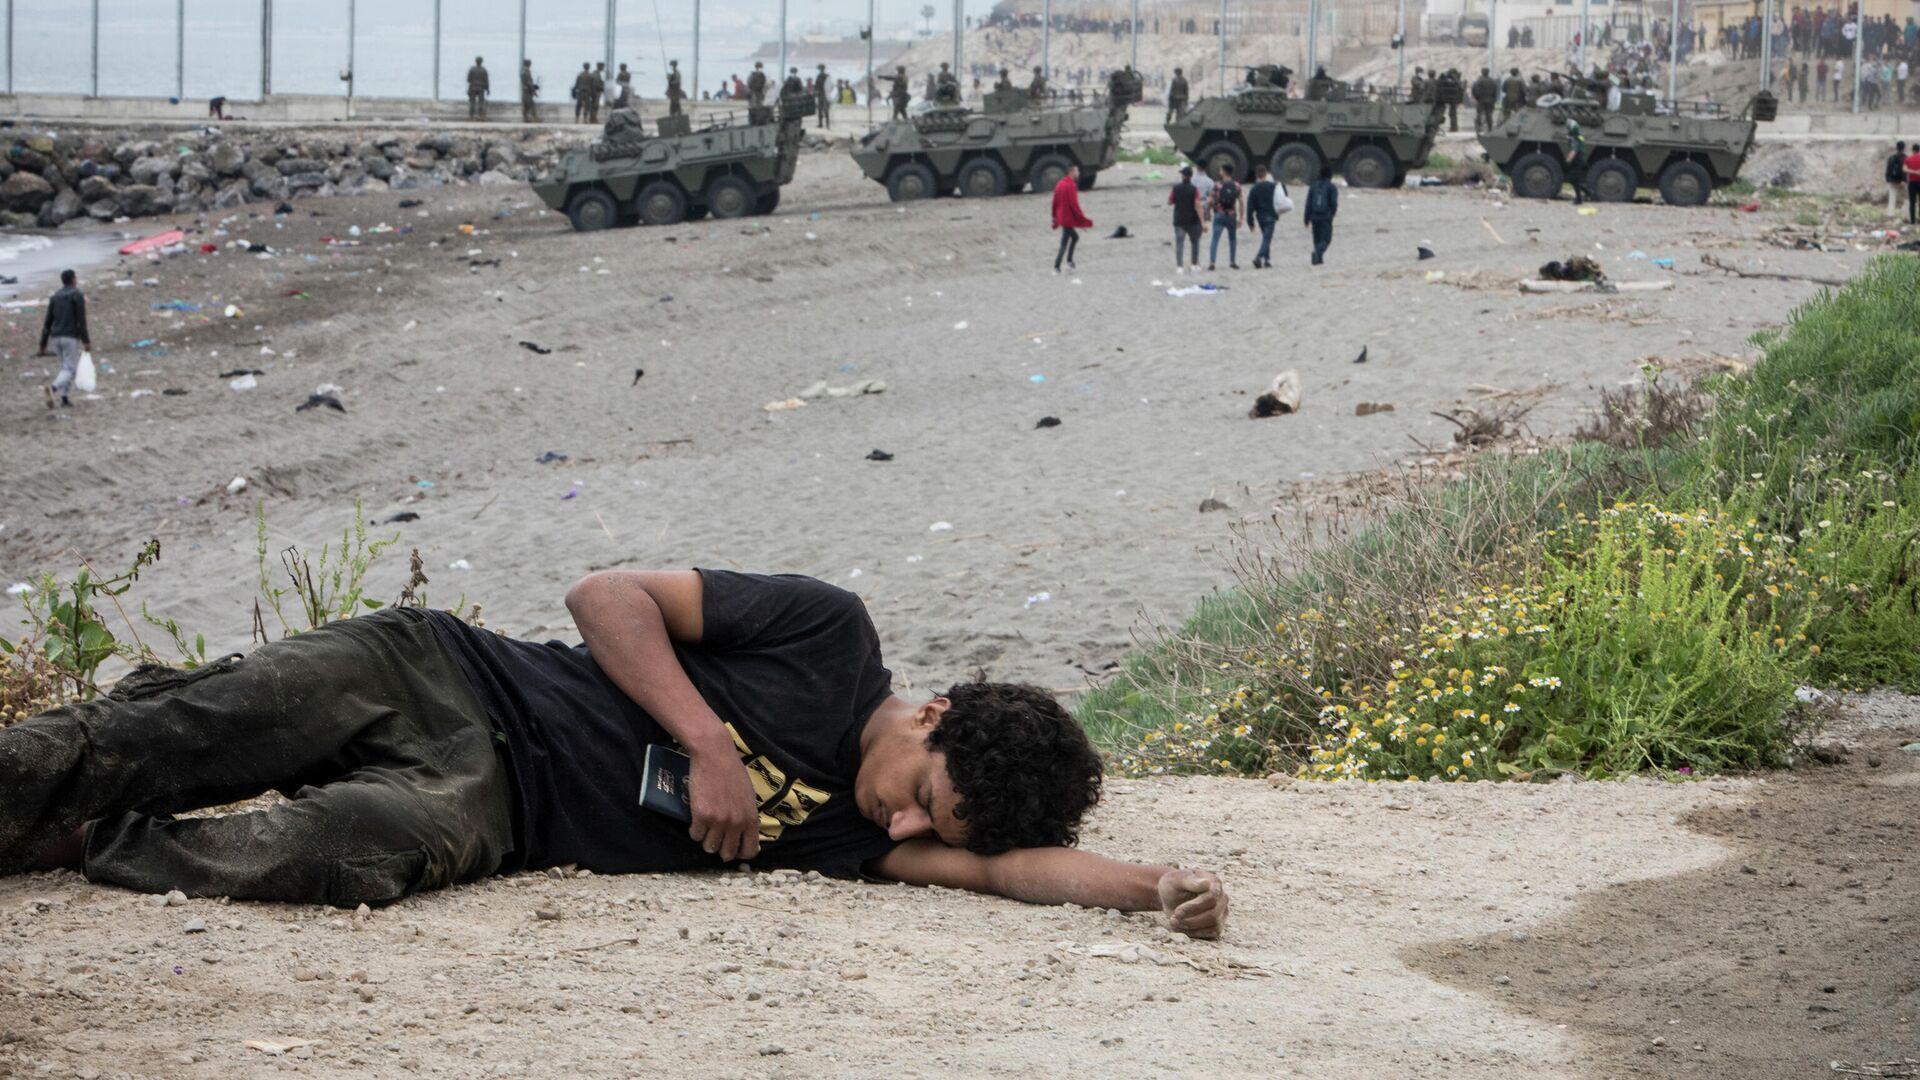 Мужчина лежит на земле после прибытия на испанскую территорию на границе Марокко и Испании - Sputnik Таджикистан, 1920, 25.05.2021